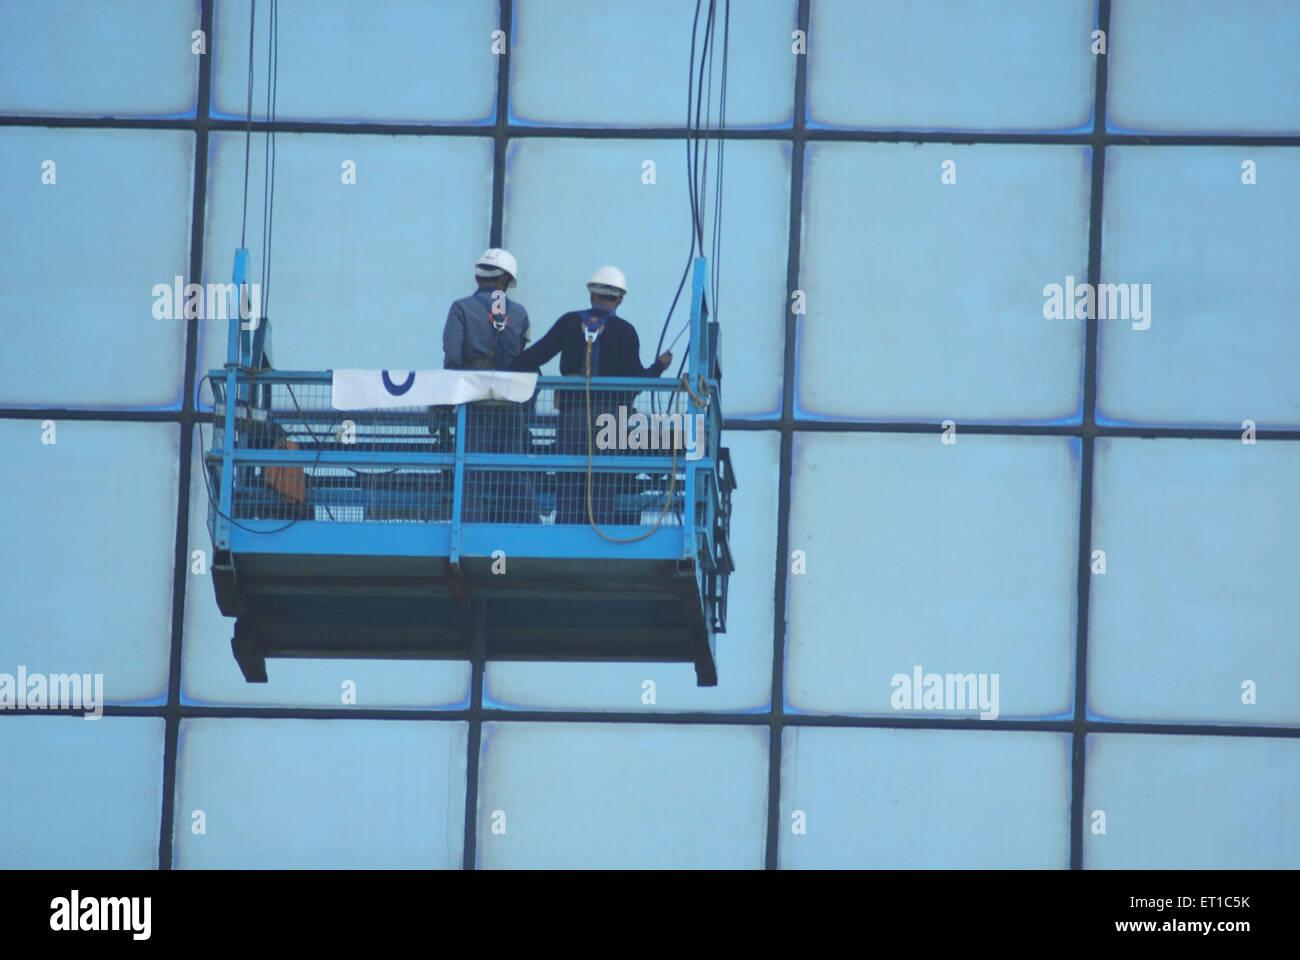 Men cleaning glass of windows ; Delhi ; India - Stock Image